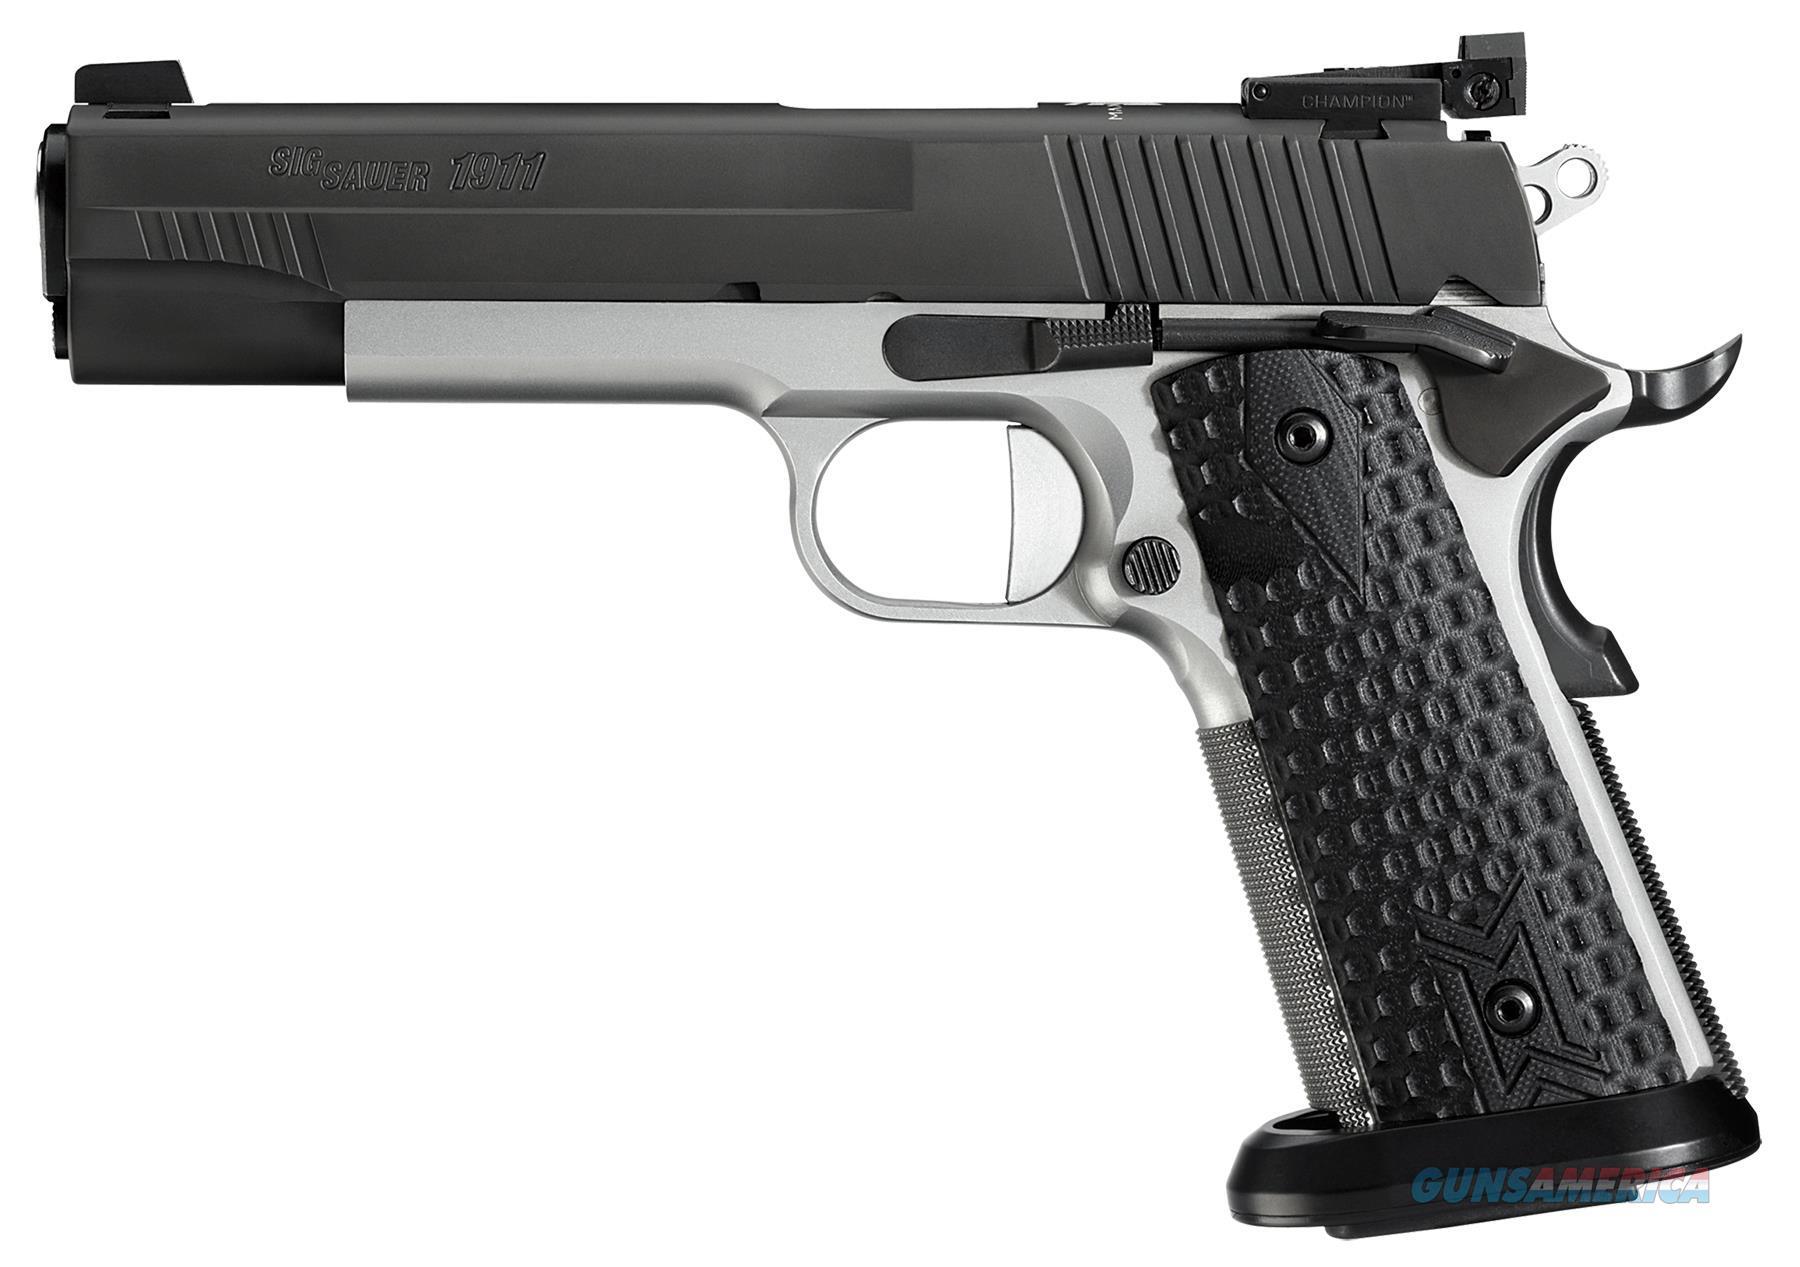 "Sig Sauer 191145Maxm 1911 Full Size Max Single 45 Automatic Colt Pistol (Acp) 5"" 8+1 Black Hogue Custom G10 Grip Black Nitron Stainless Steel 1911-45-MAXM  Guns > Pistols > S Misc Pistols"